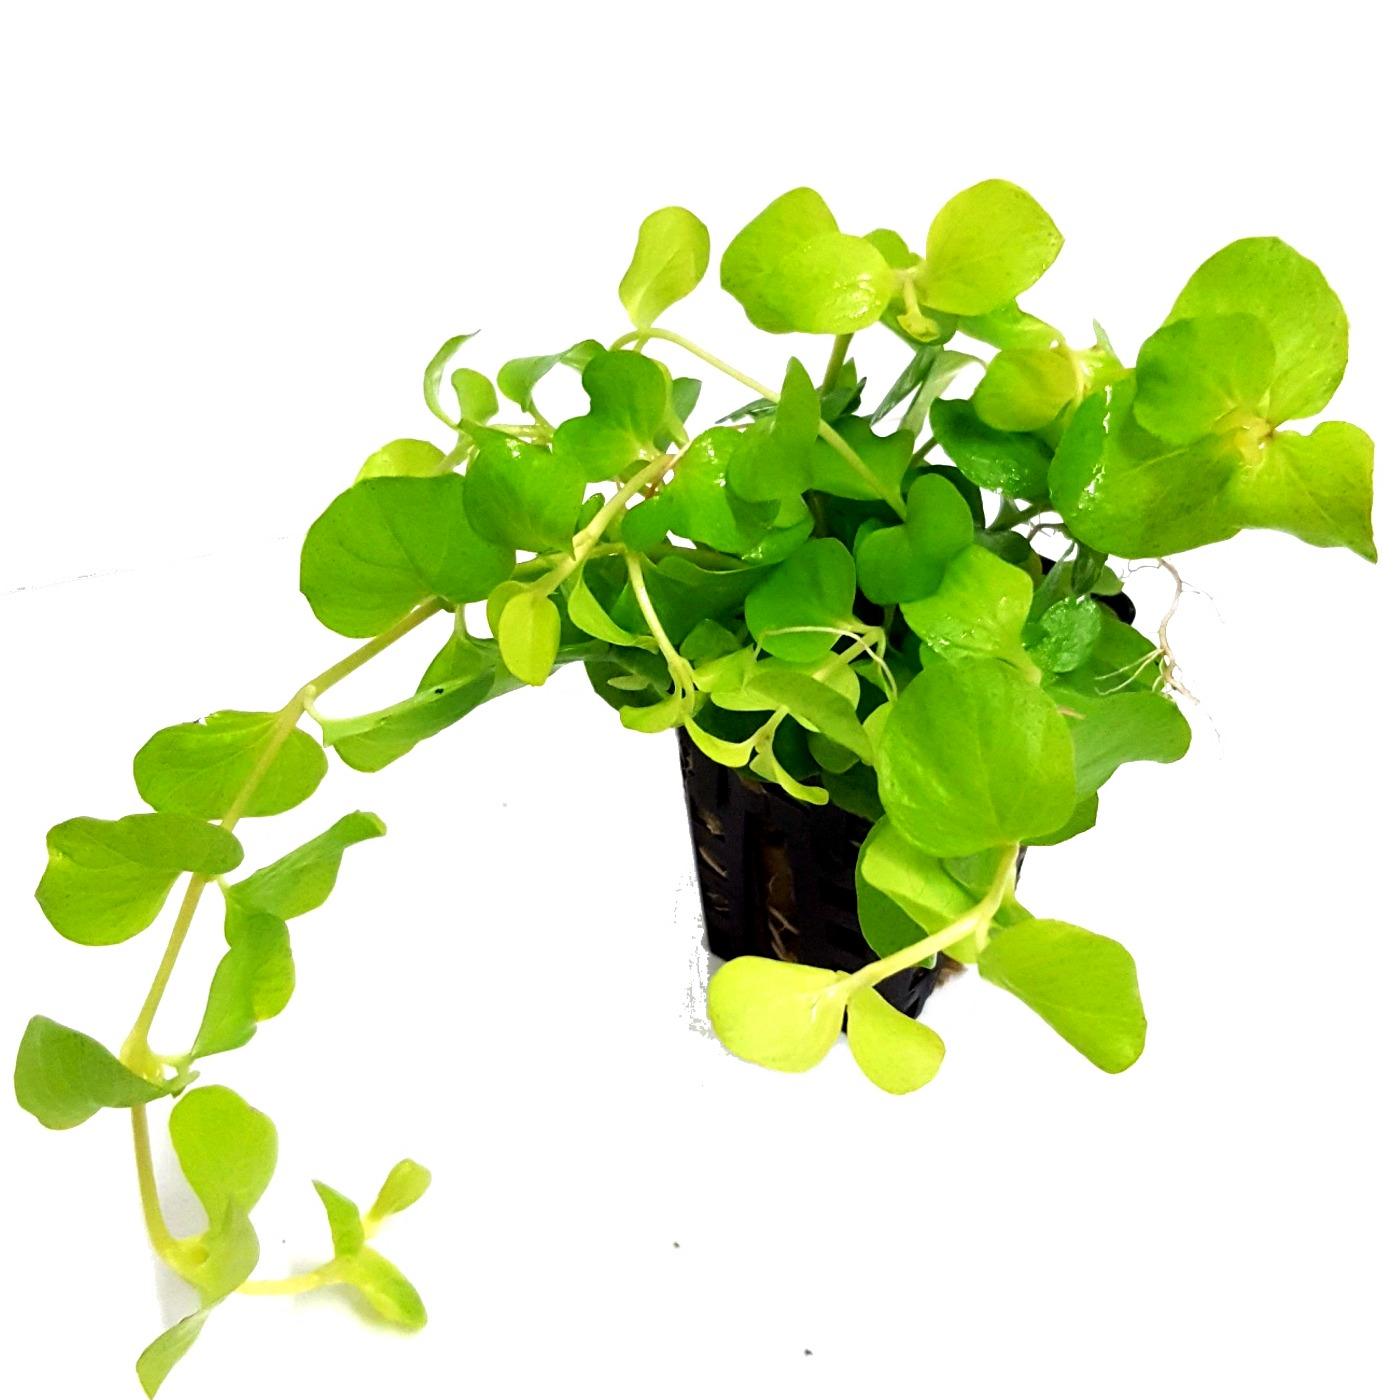 Lysimachia nummularia Aurea plante d\'aquarium en pot de diamètre 5 cm